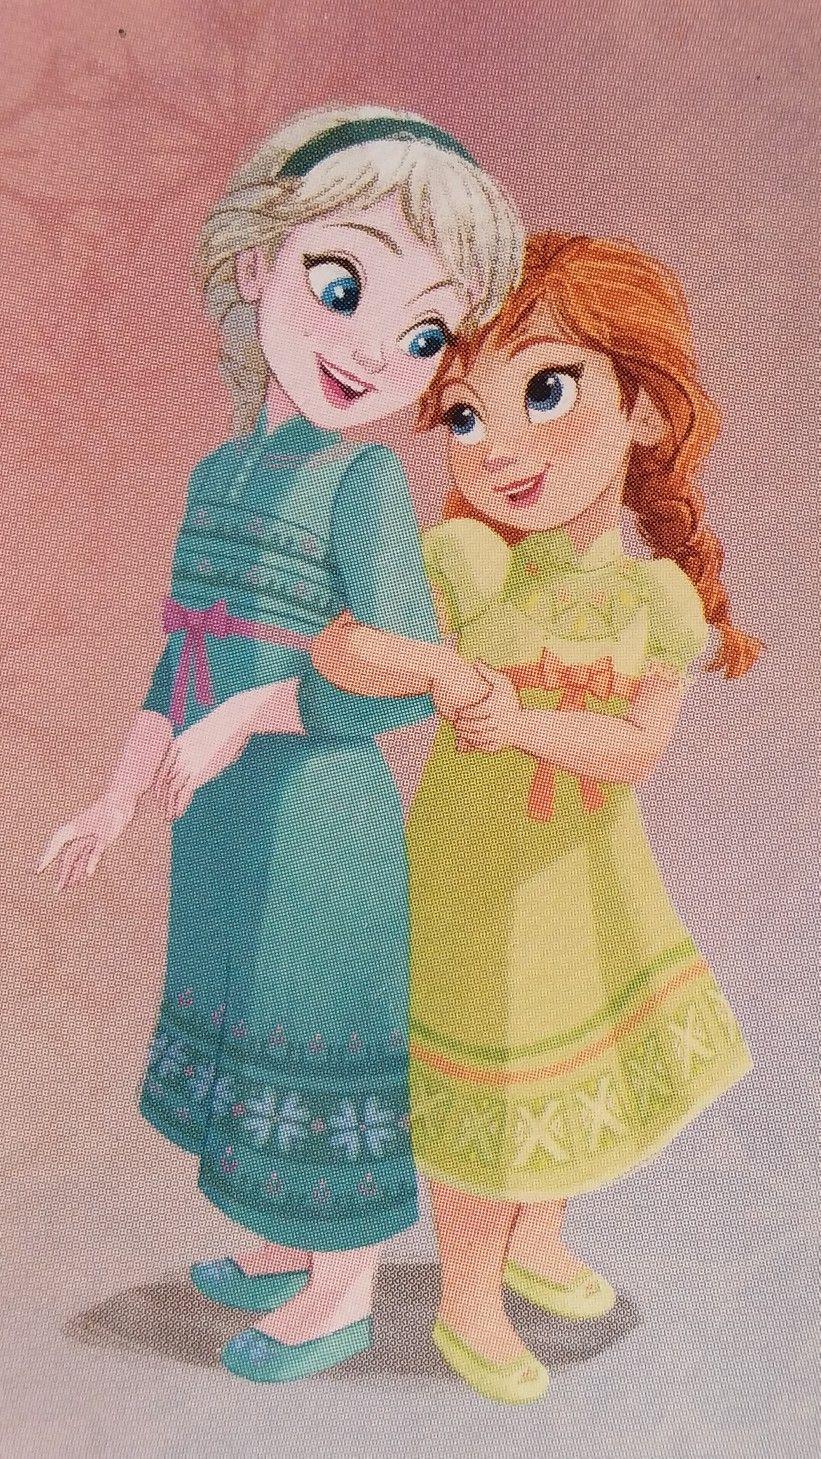 Frozen 2 Anna And Elsa Toddler Frozen Disney Movie Disney Princess Pictures Disney Princess Art